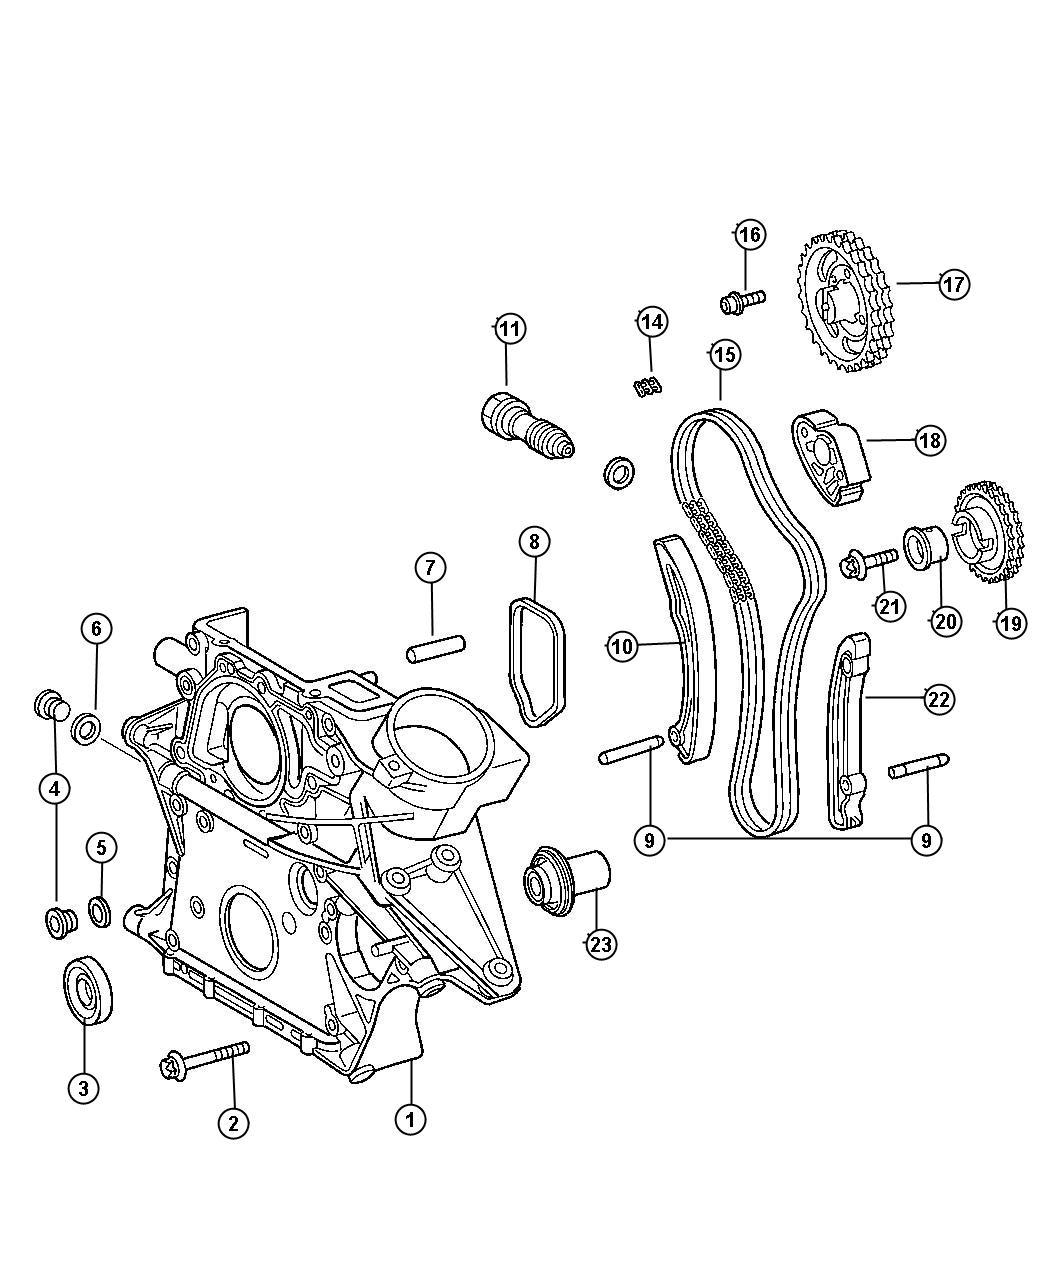 Chrysler Crossfire Bolt Screw M8x1 25x70 Mounting